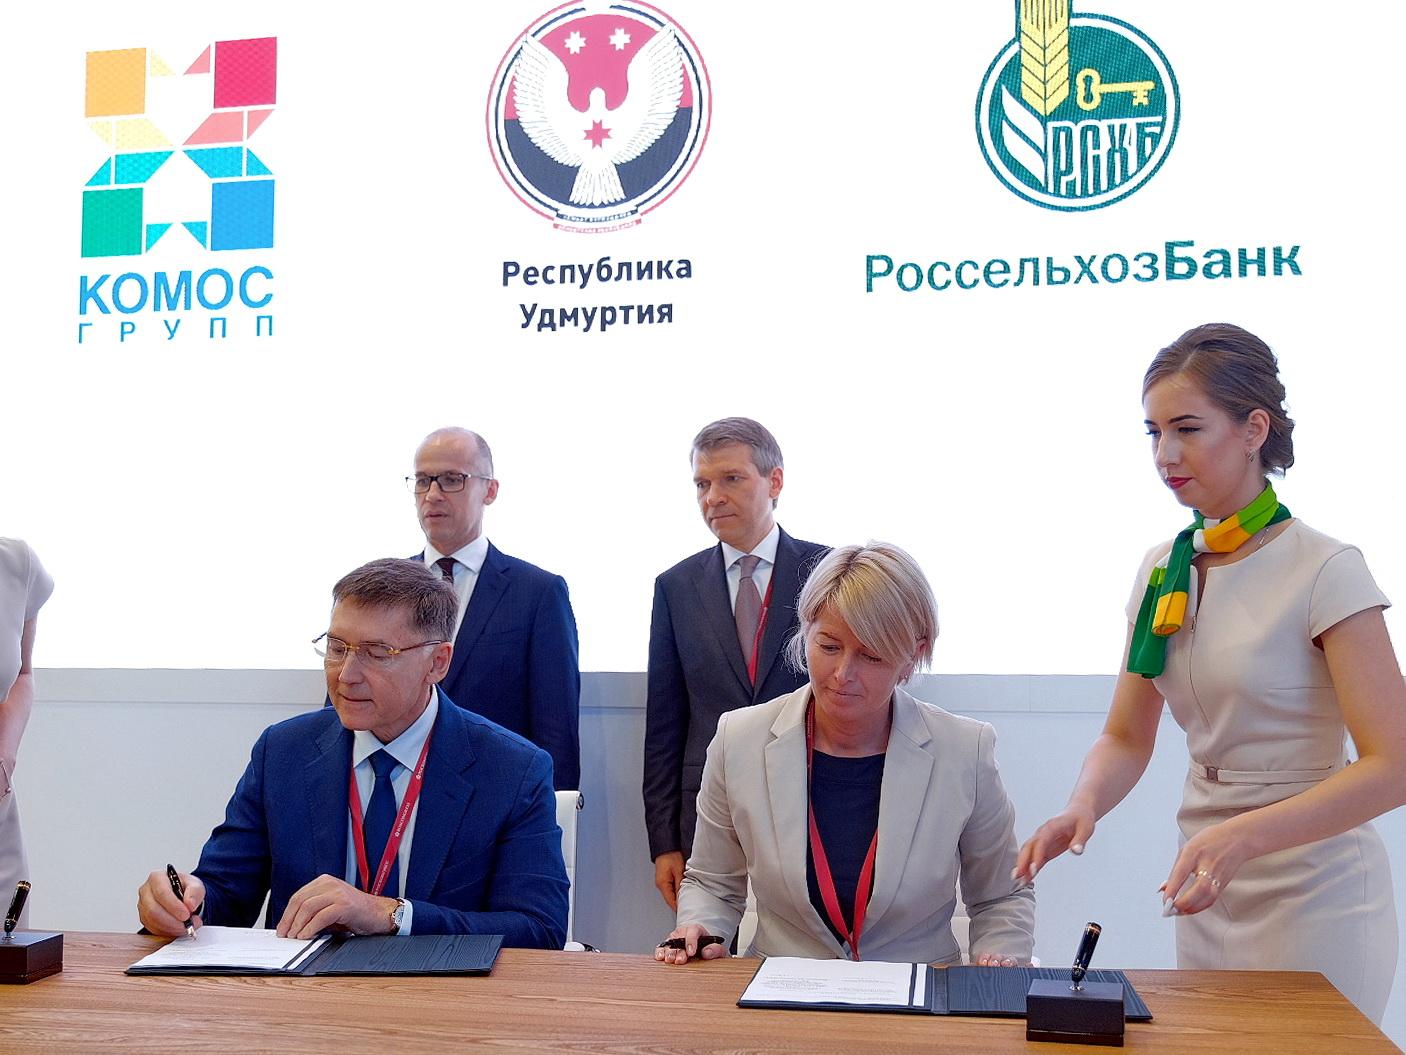 https://www.dairynews.ru/news-image/2019/june/20190610/pmef2.jpg